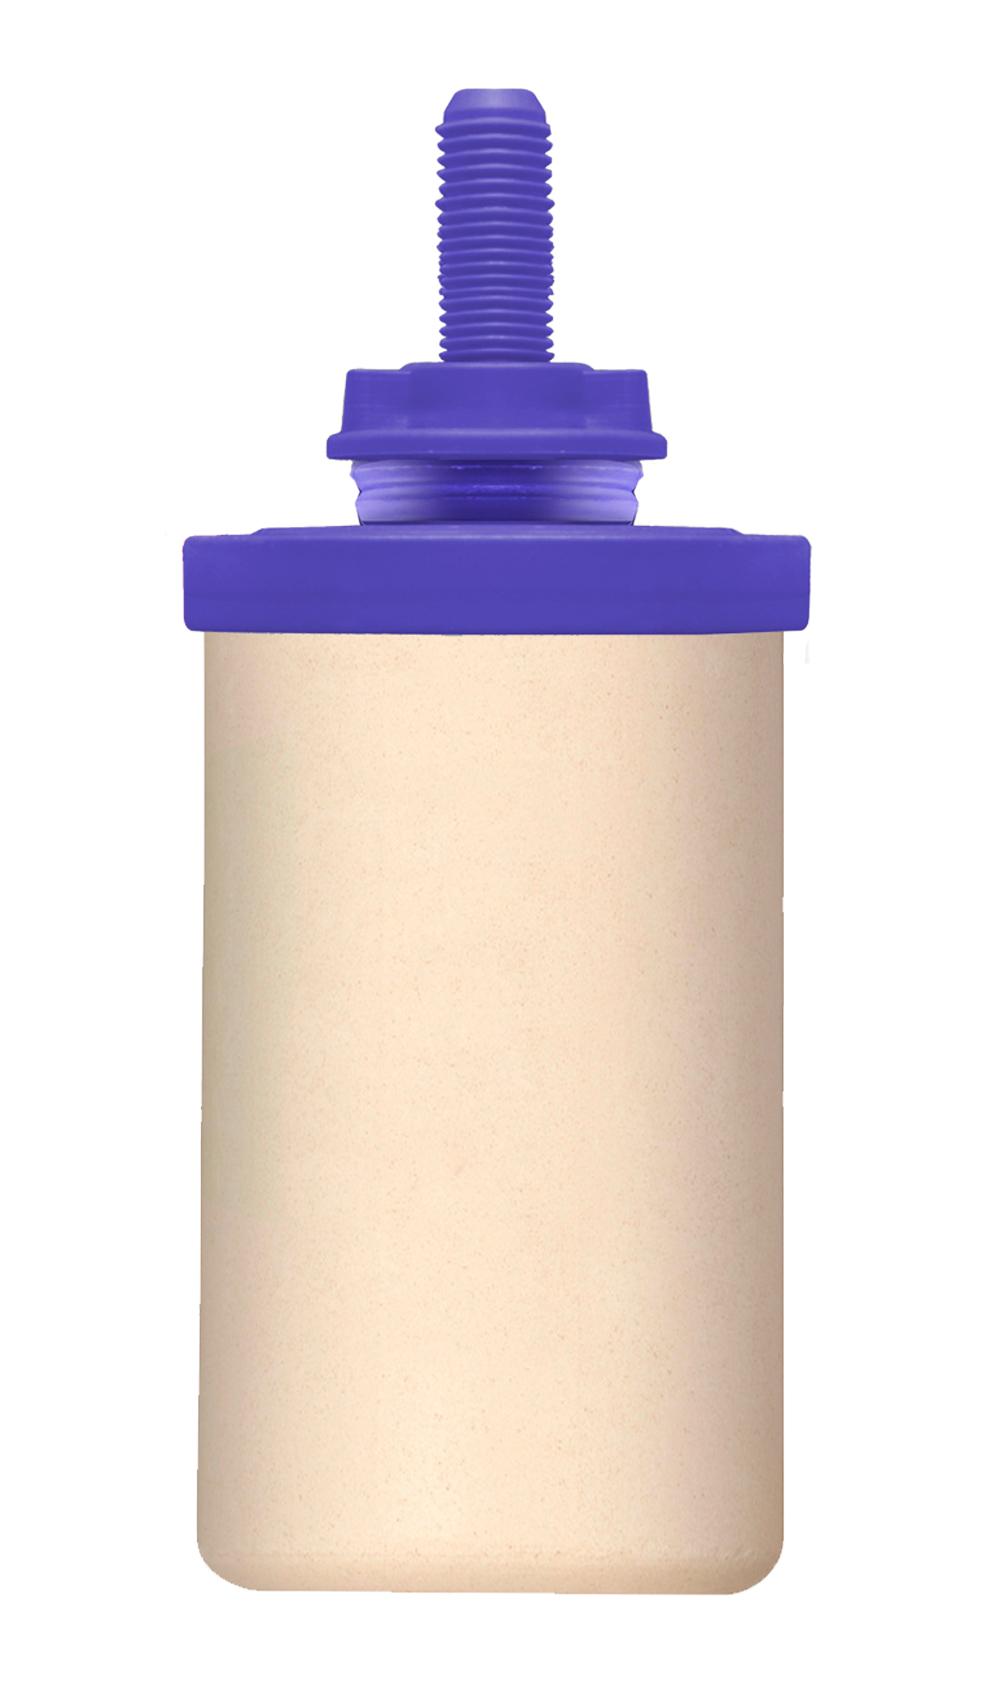 Filtro Purificador para Bebedouro Agua Ecopratic 18 L com 03 velas alcalinas  - CN Distribuidora